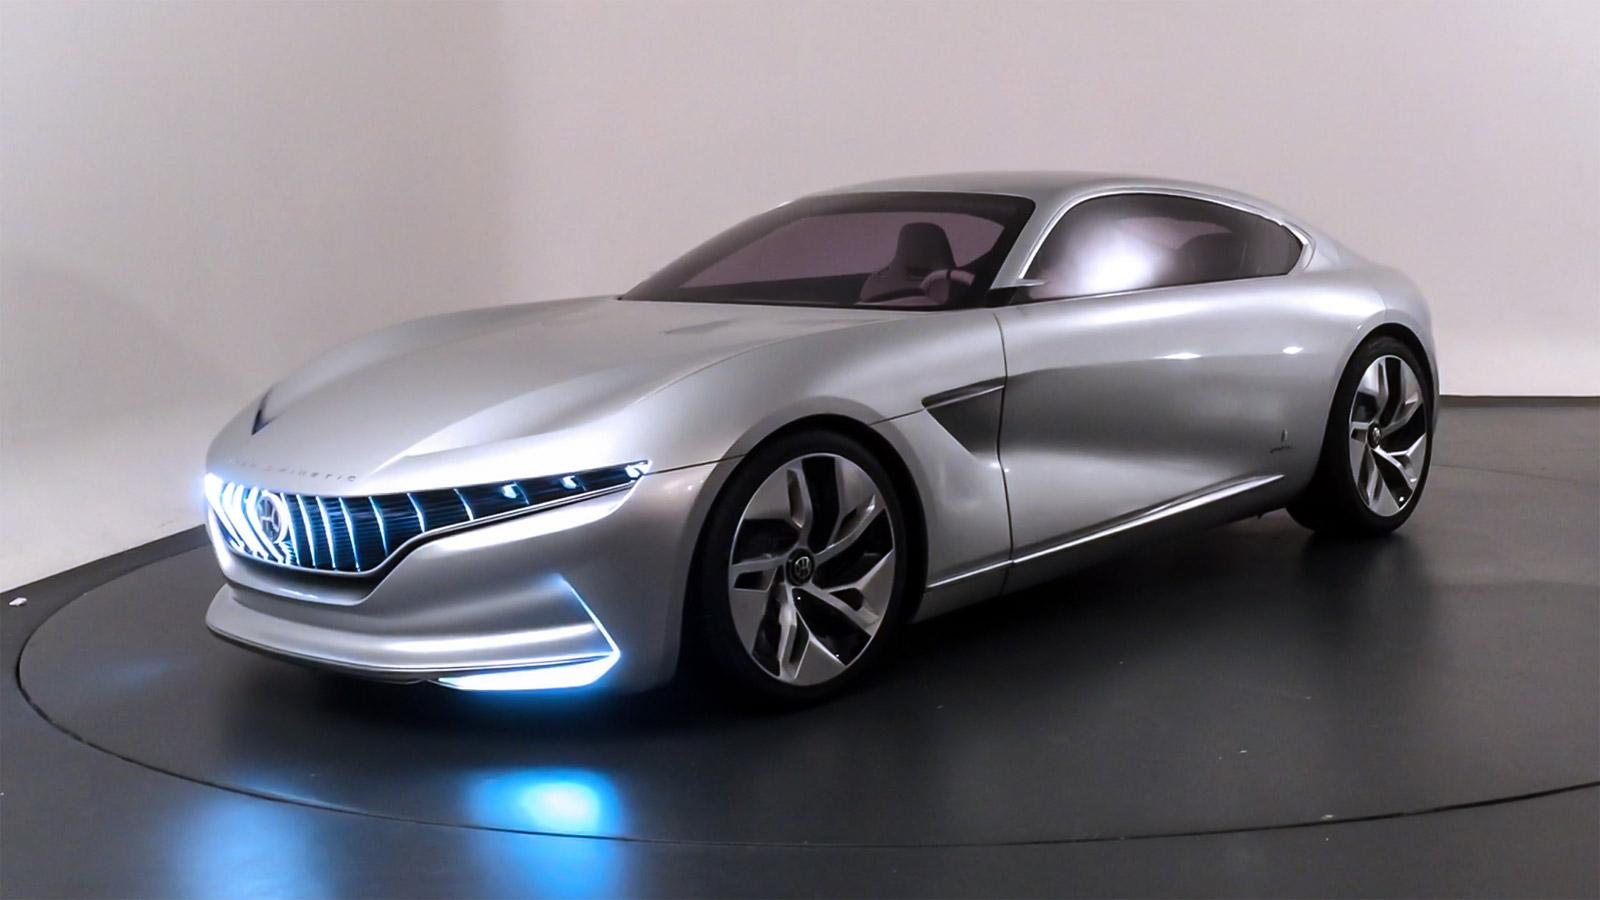 2018 - [Pininfarina] PF0 Concept / Battista  01-Pininfarina-HK-GT-12